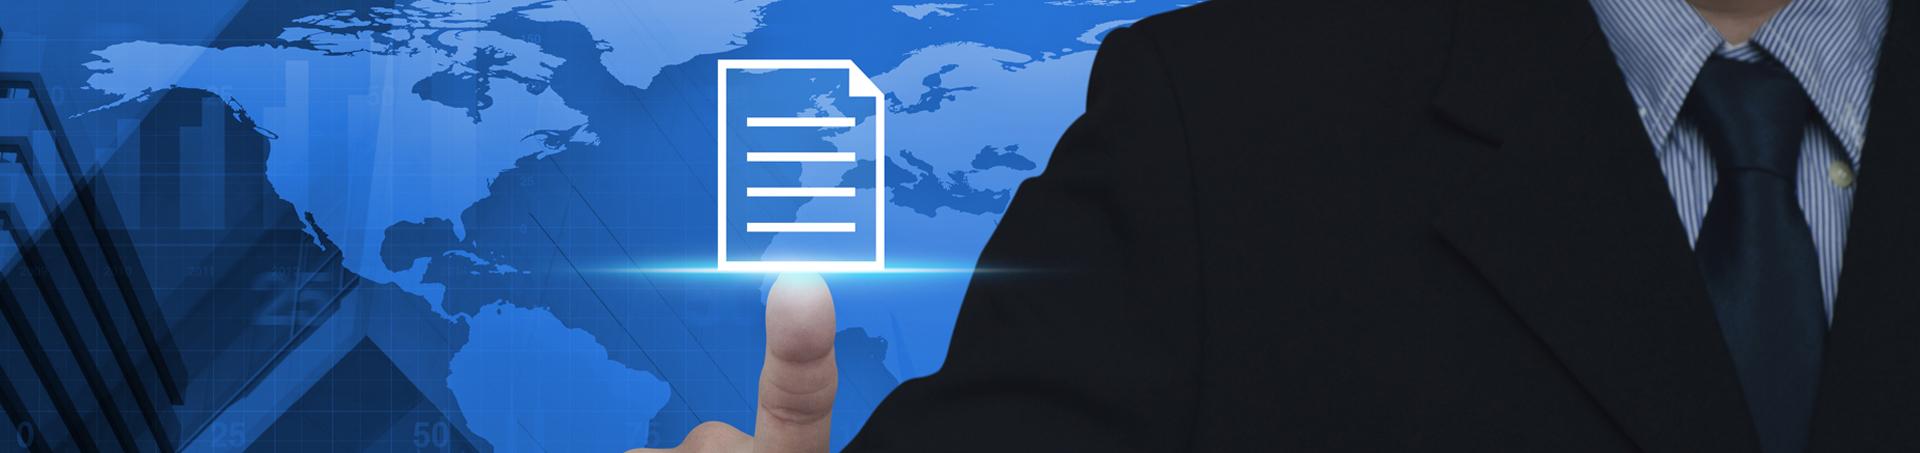 I numerosi servizi del Document Management System